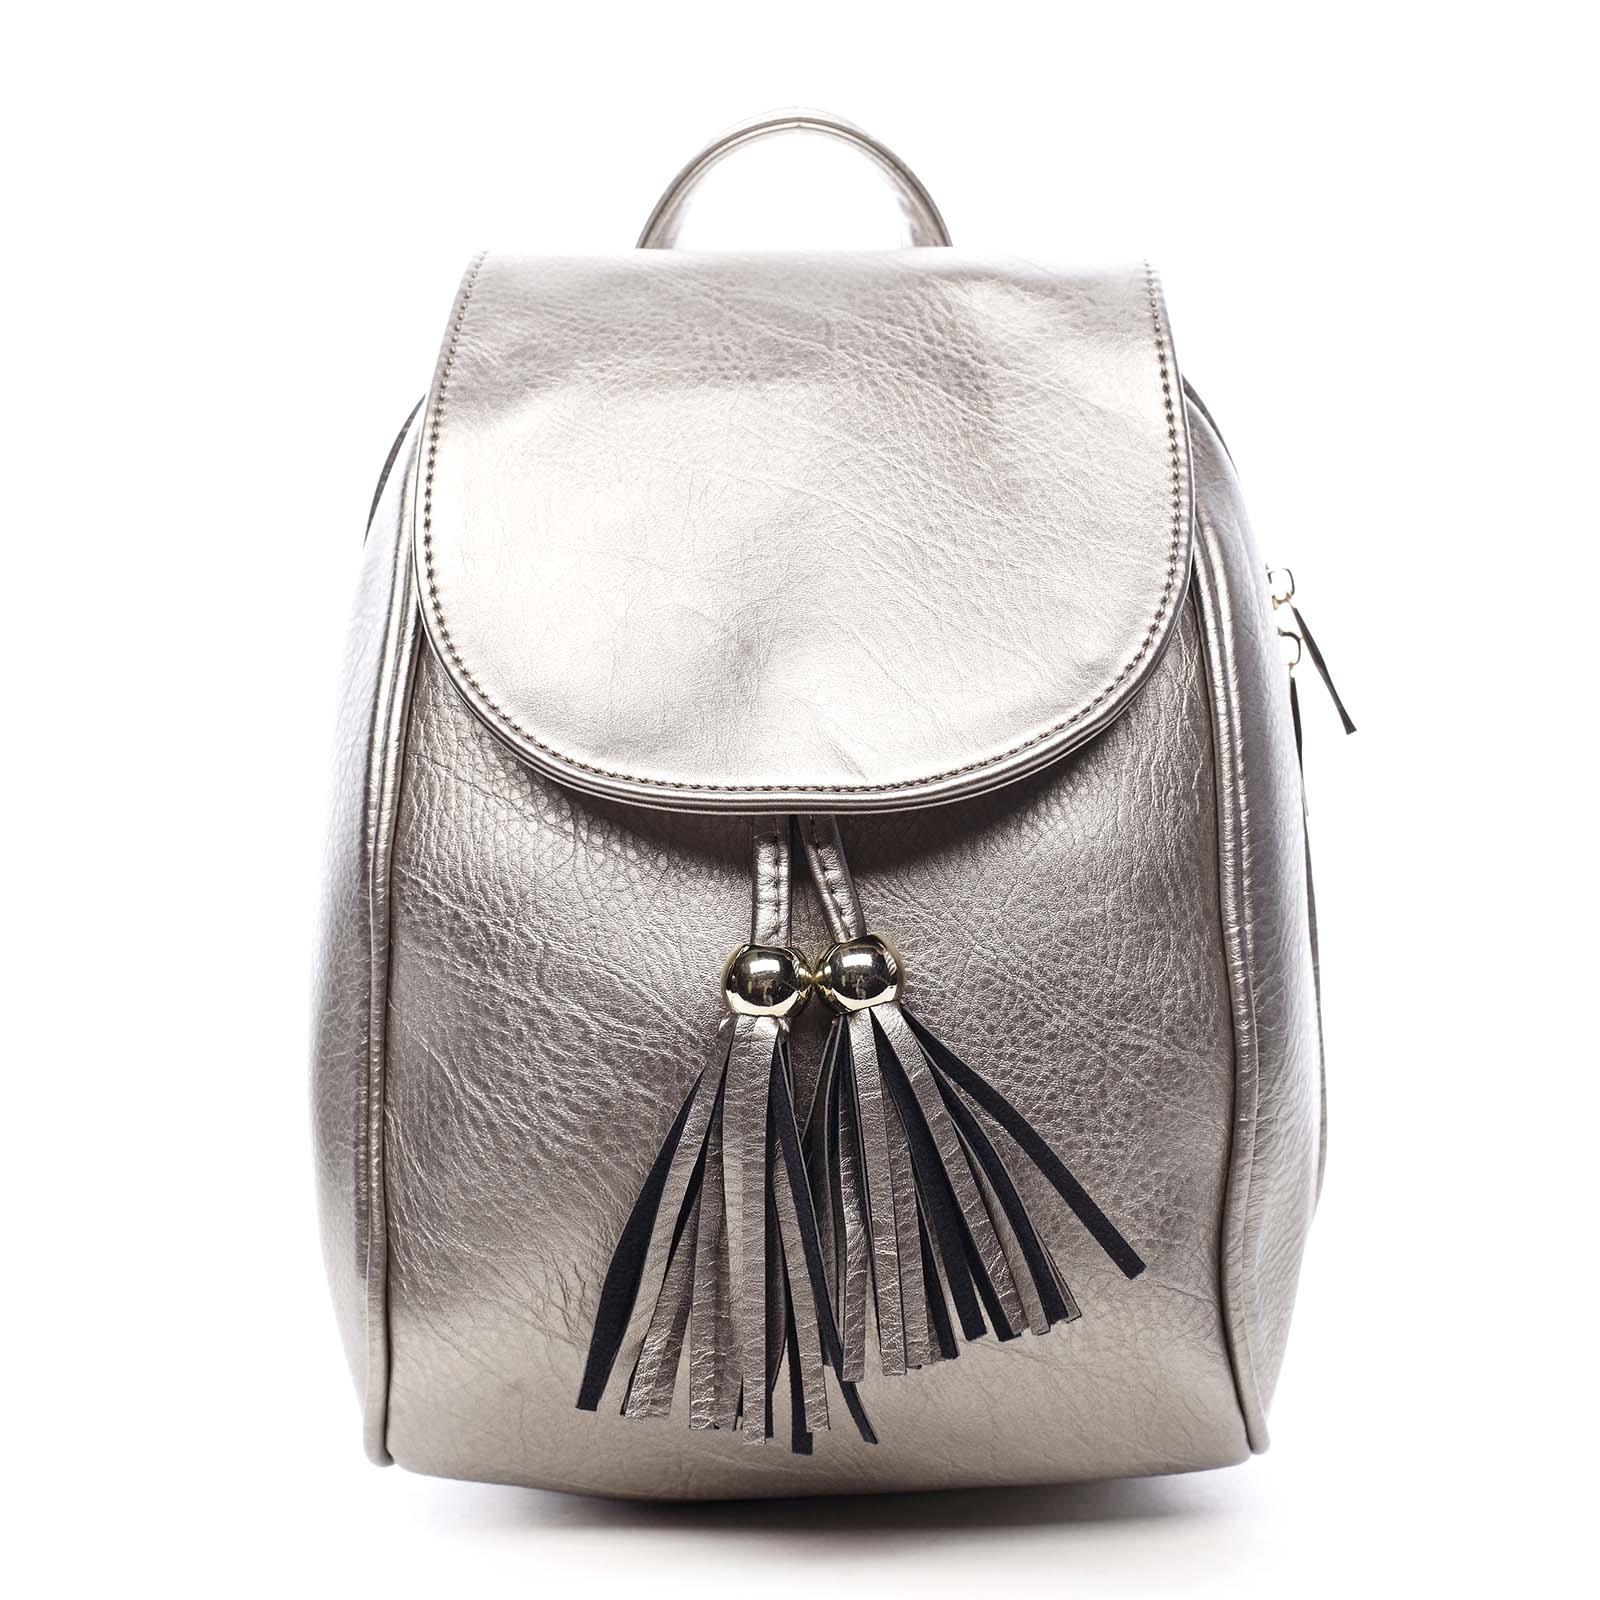 Dámský batůžek stříbrný - Silvia Rosa Roseph